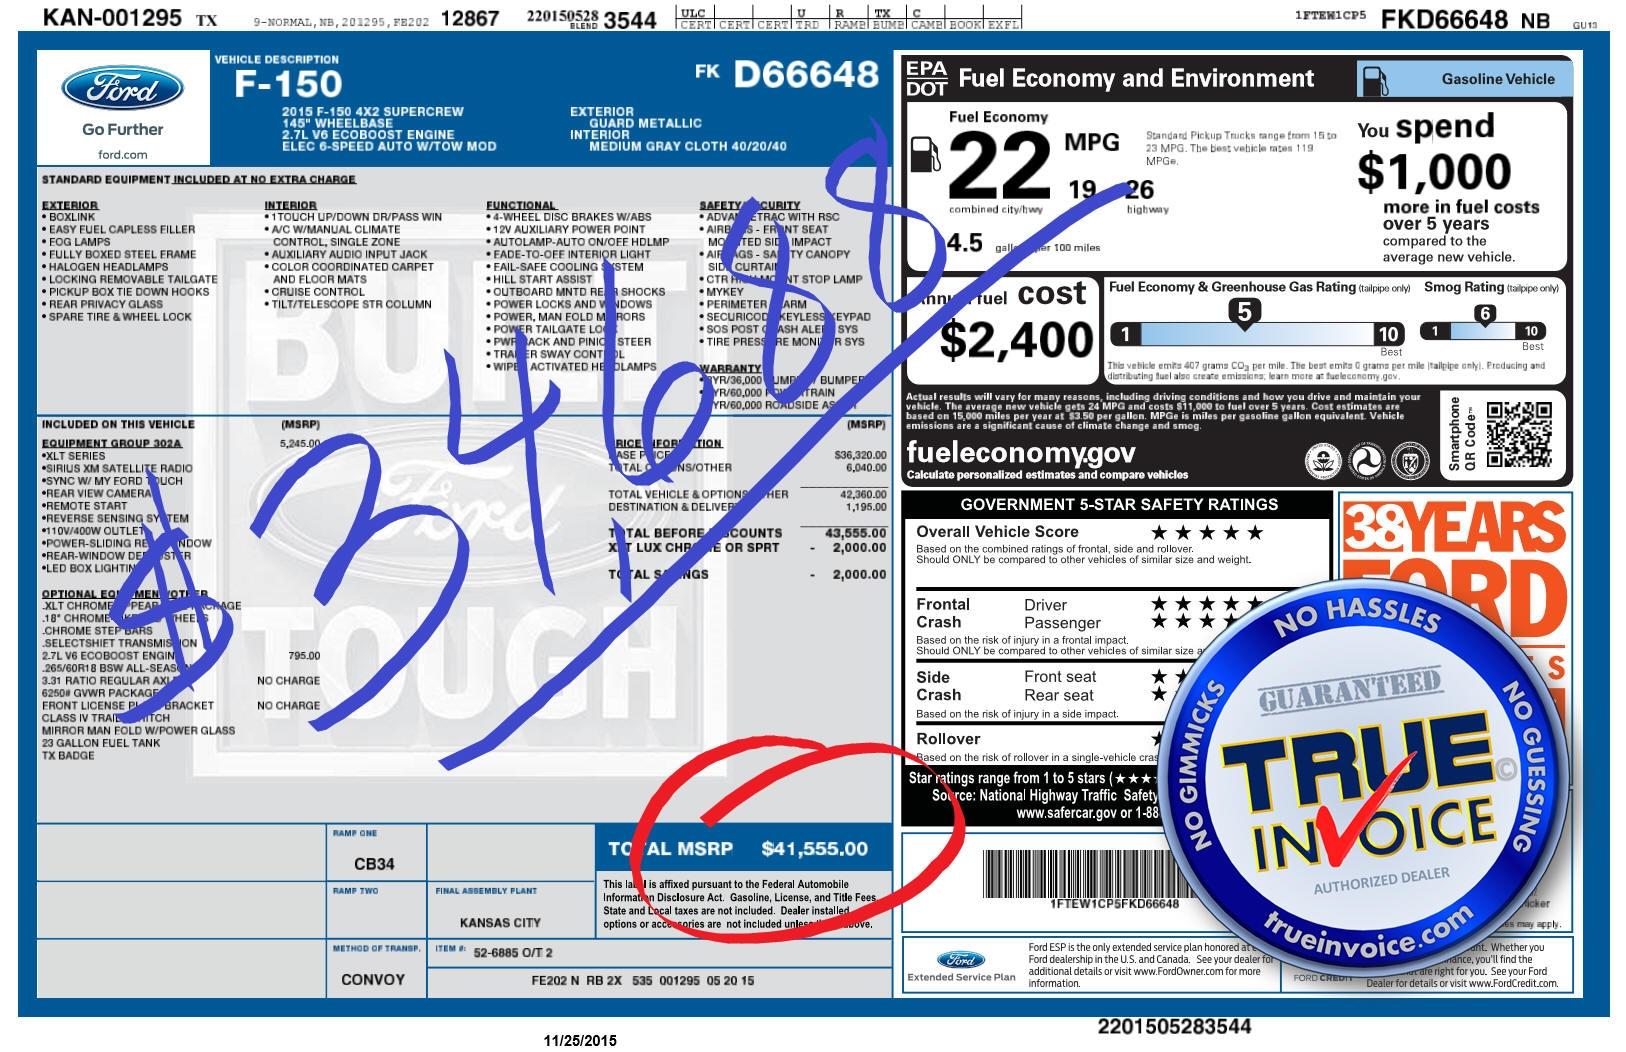 true invoice 2016 ford f150 dealer invoice price honda